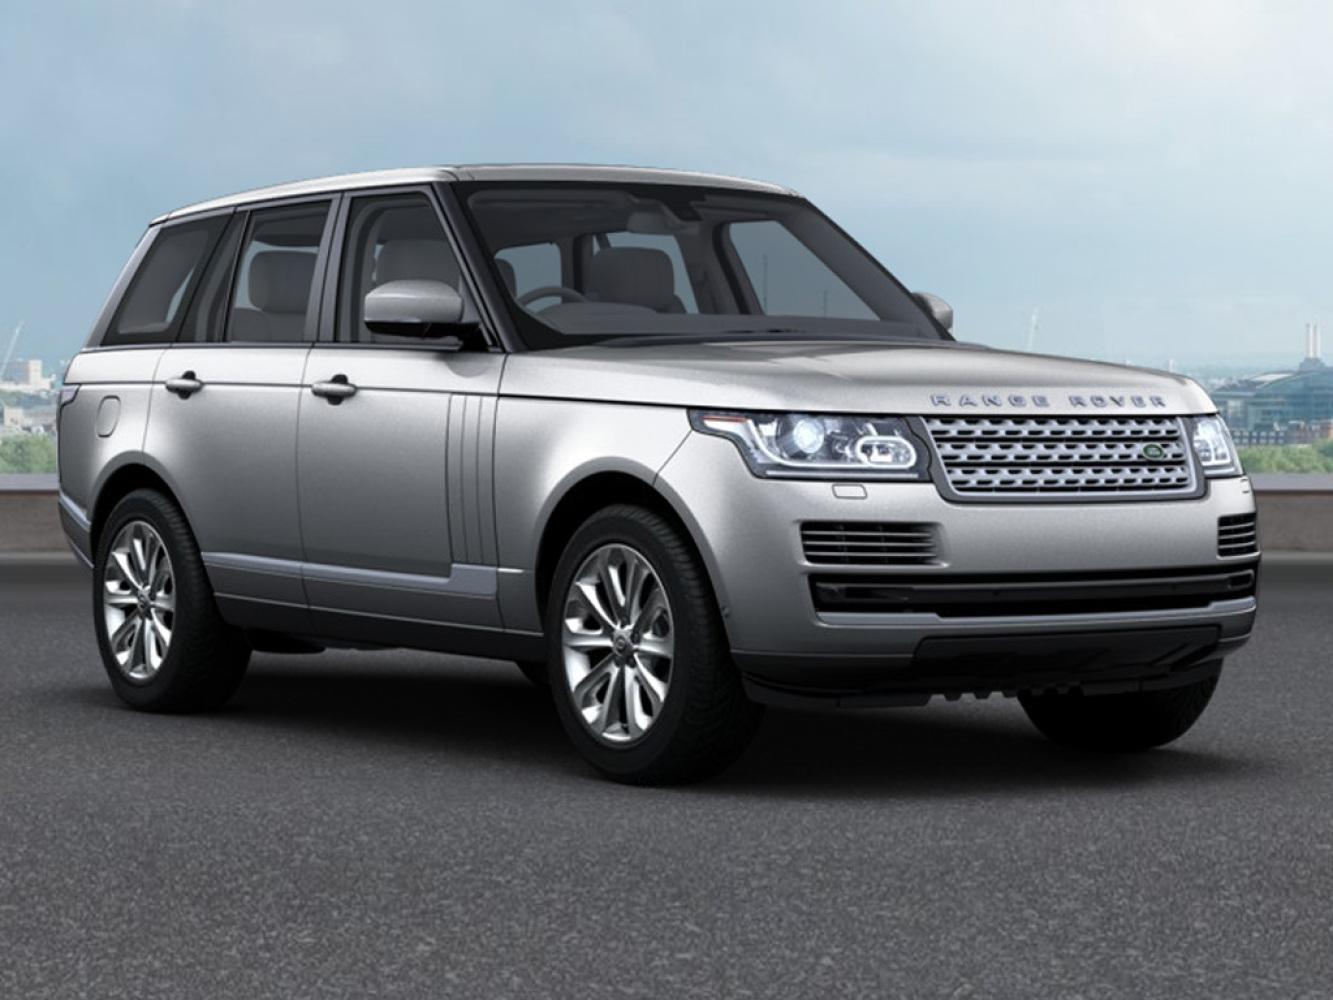 new land rover range rover 2 0 p400e vogue 4dr auto estate. Black Bedroom Furniture Sets. Home Design Ideas